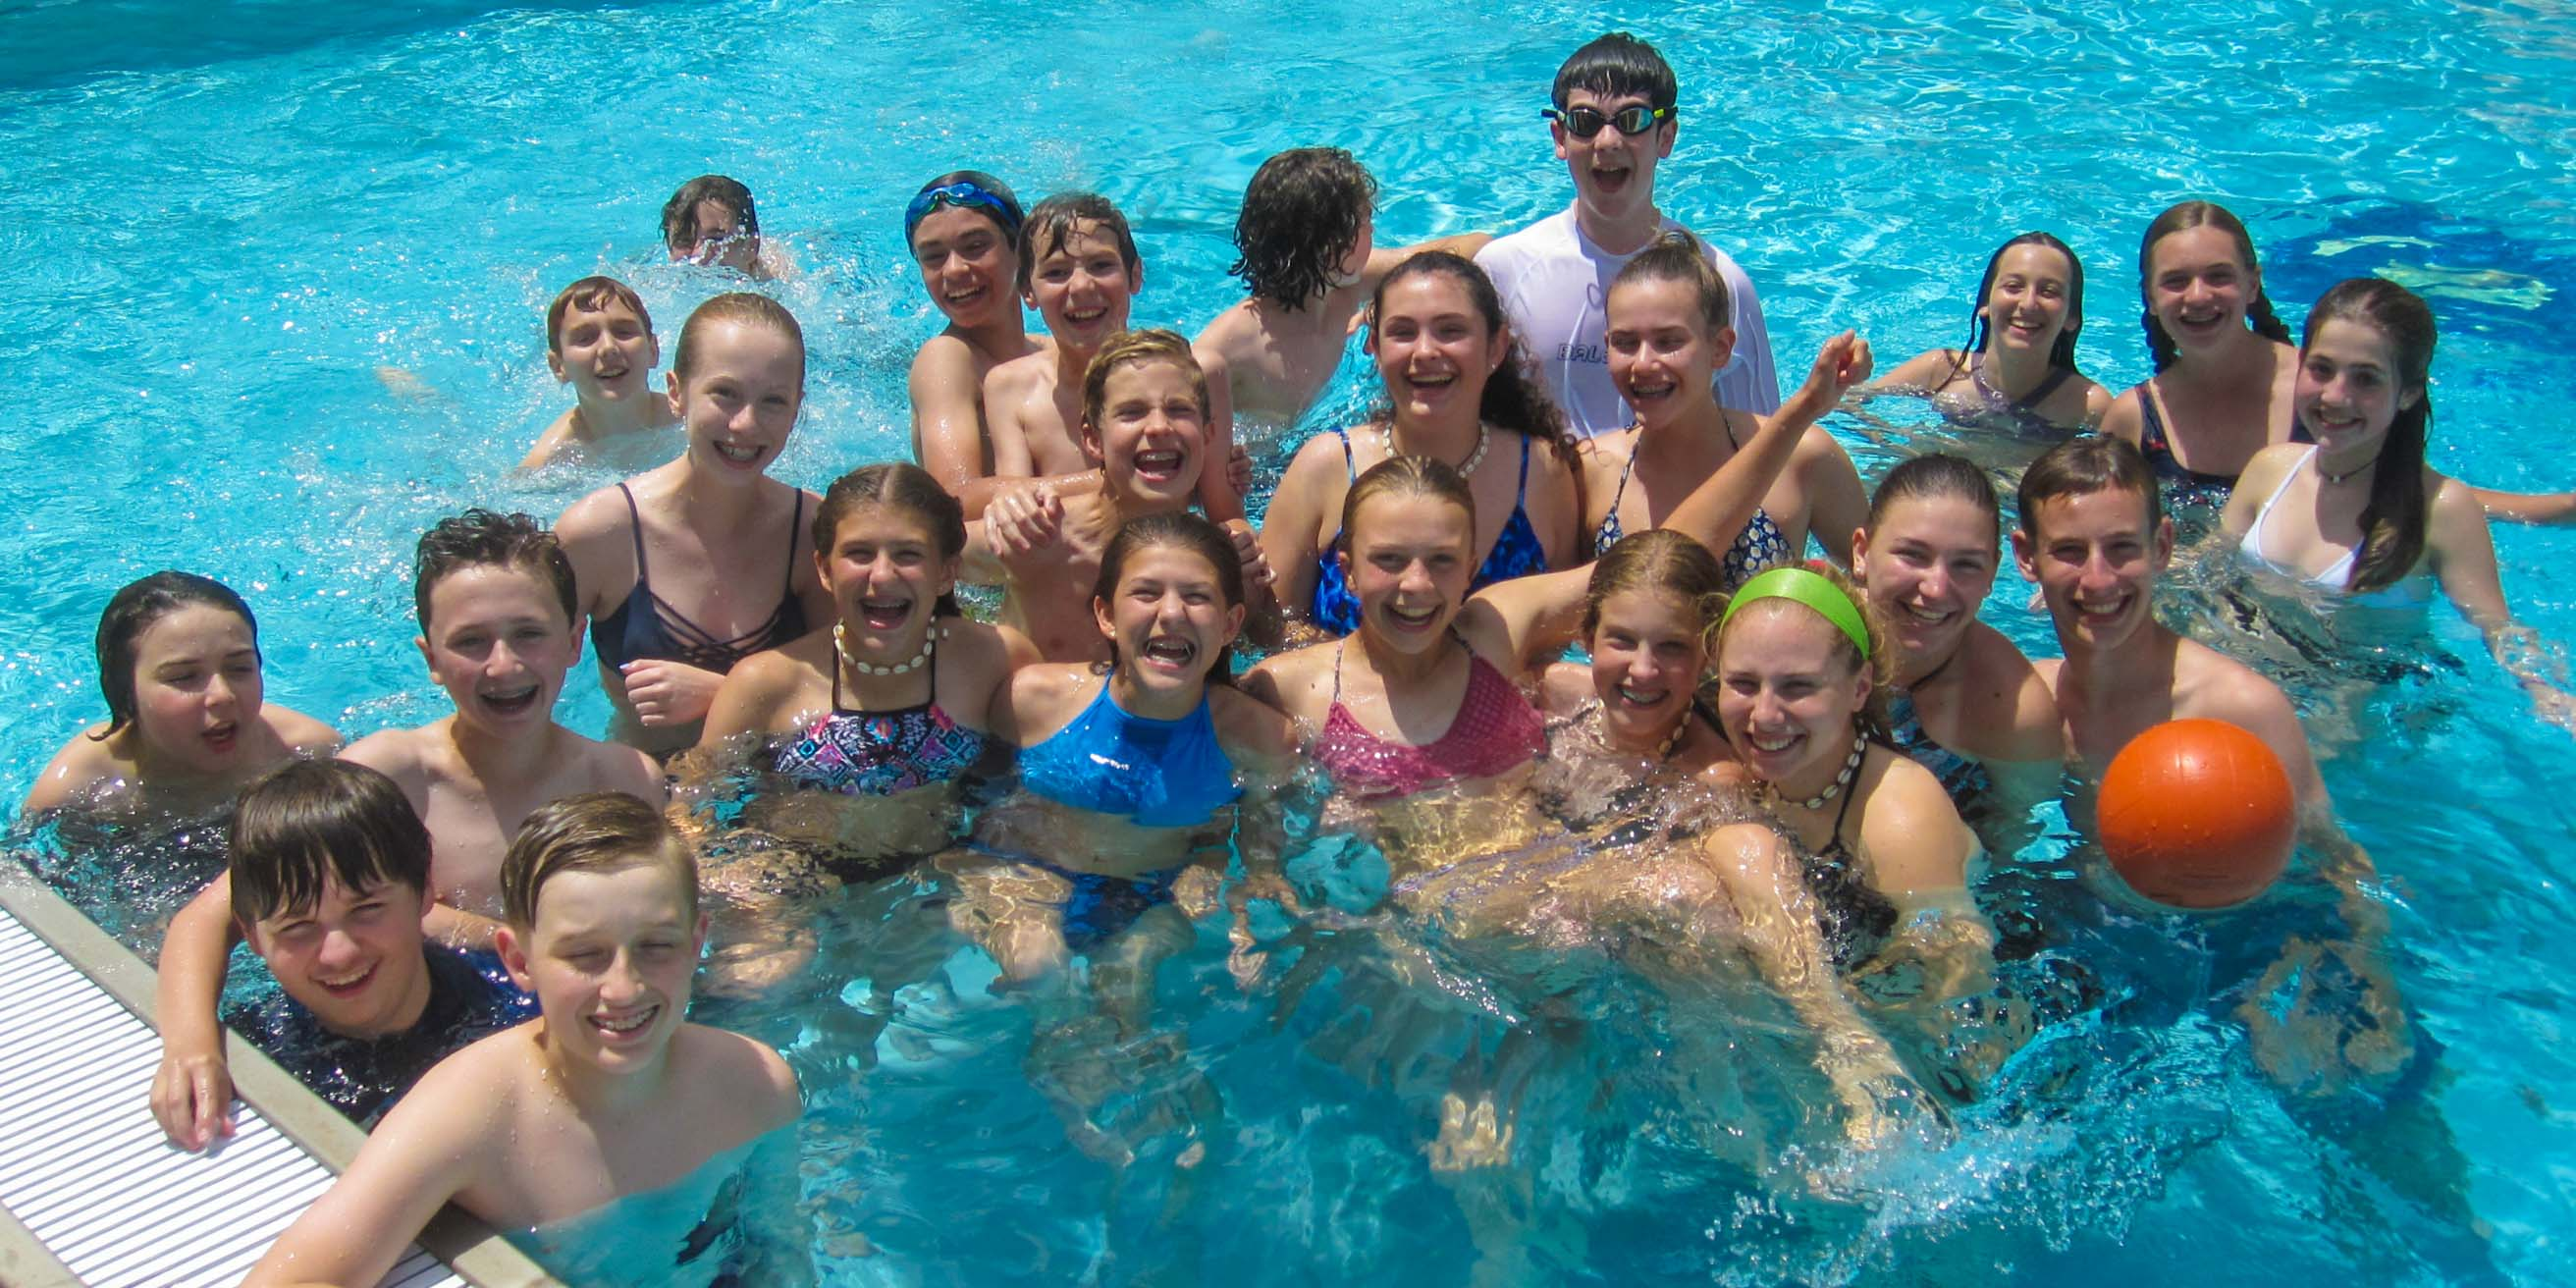 Group of kids in pool